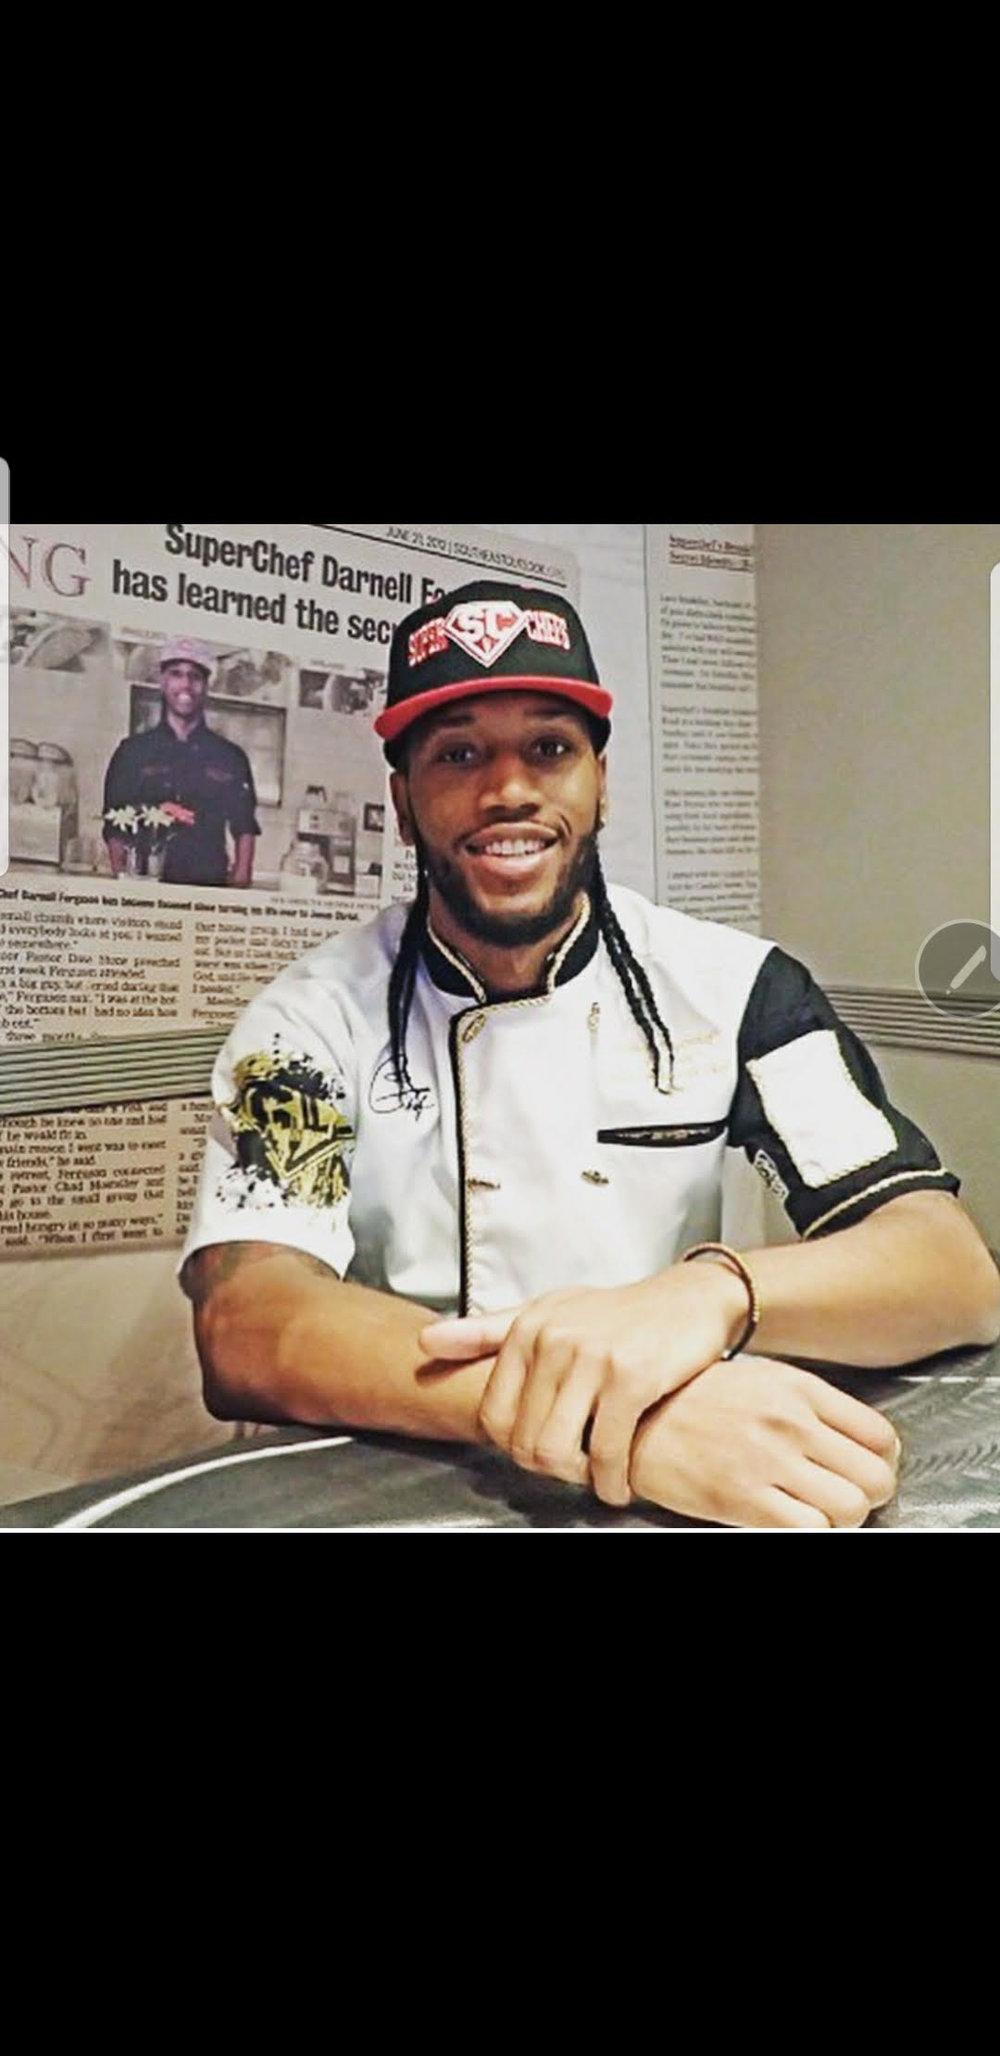 Darnell Ferguson  -  Owner/Chef, SuperChef's